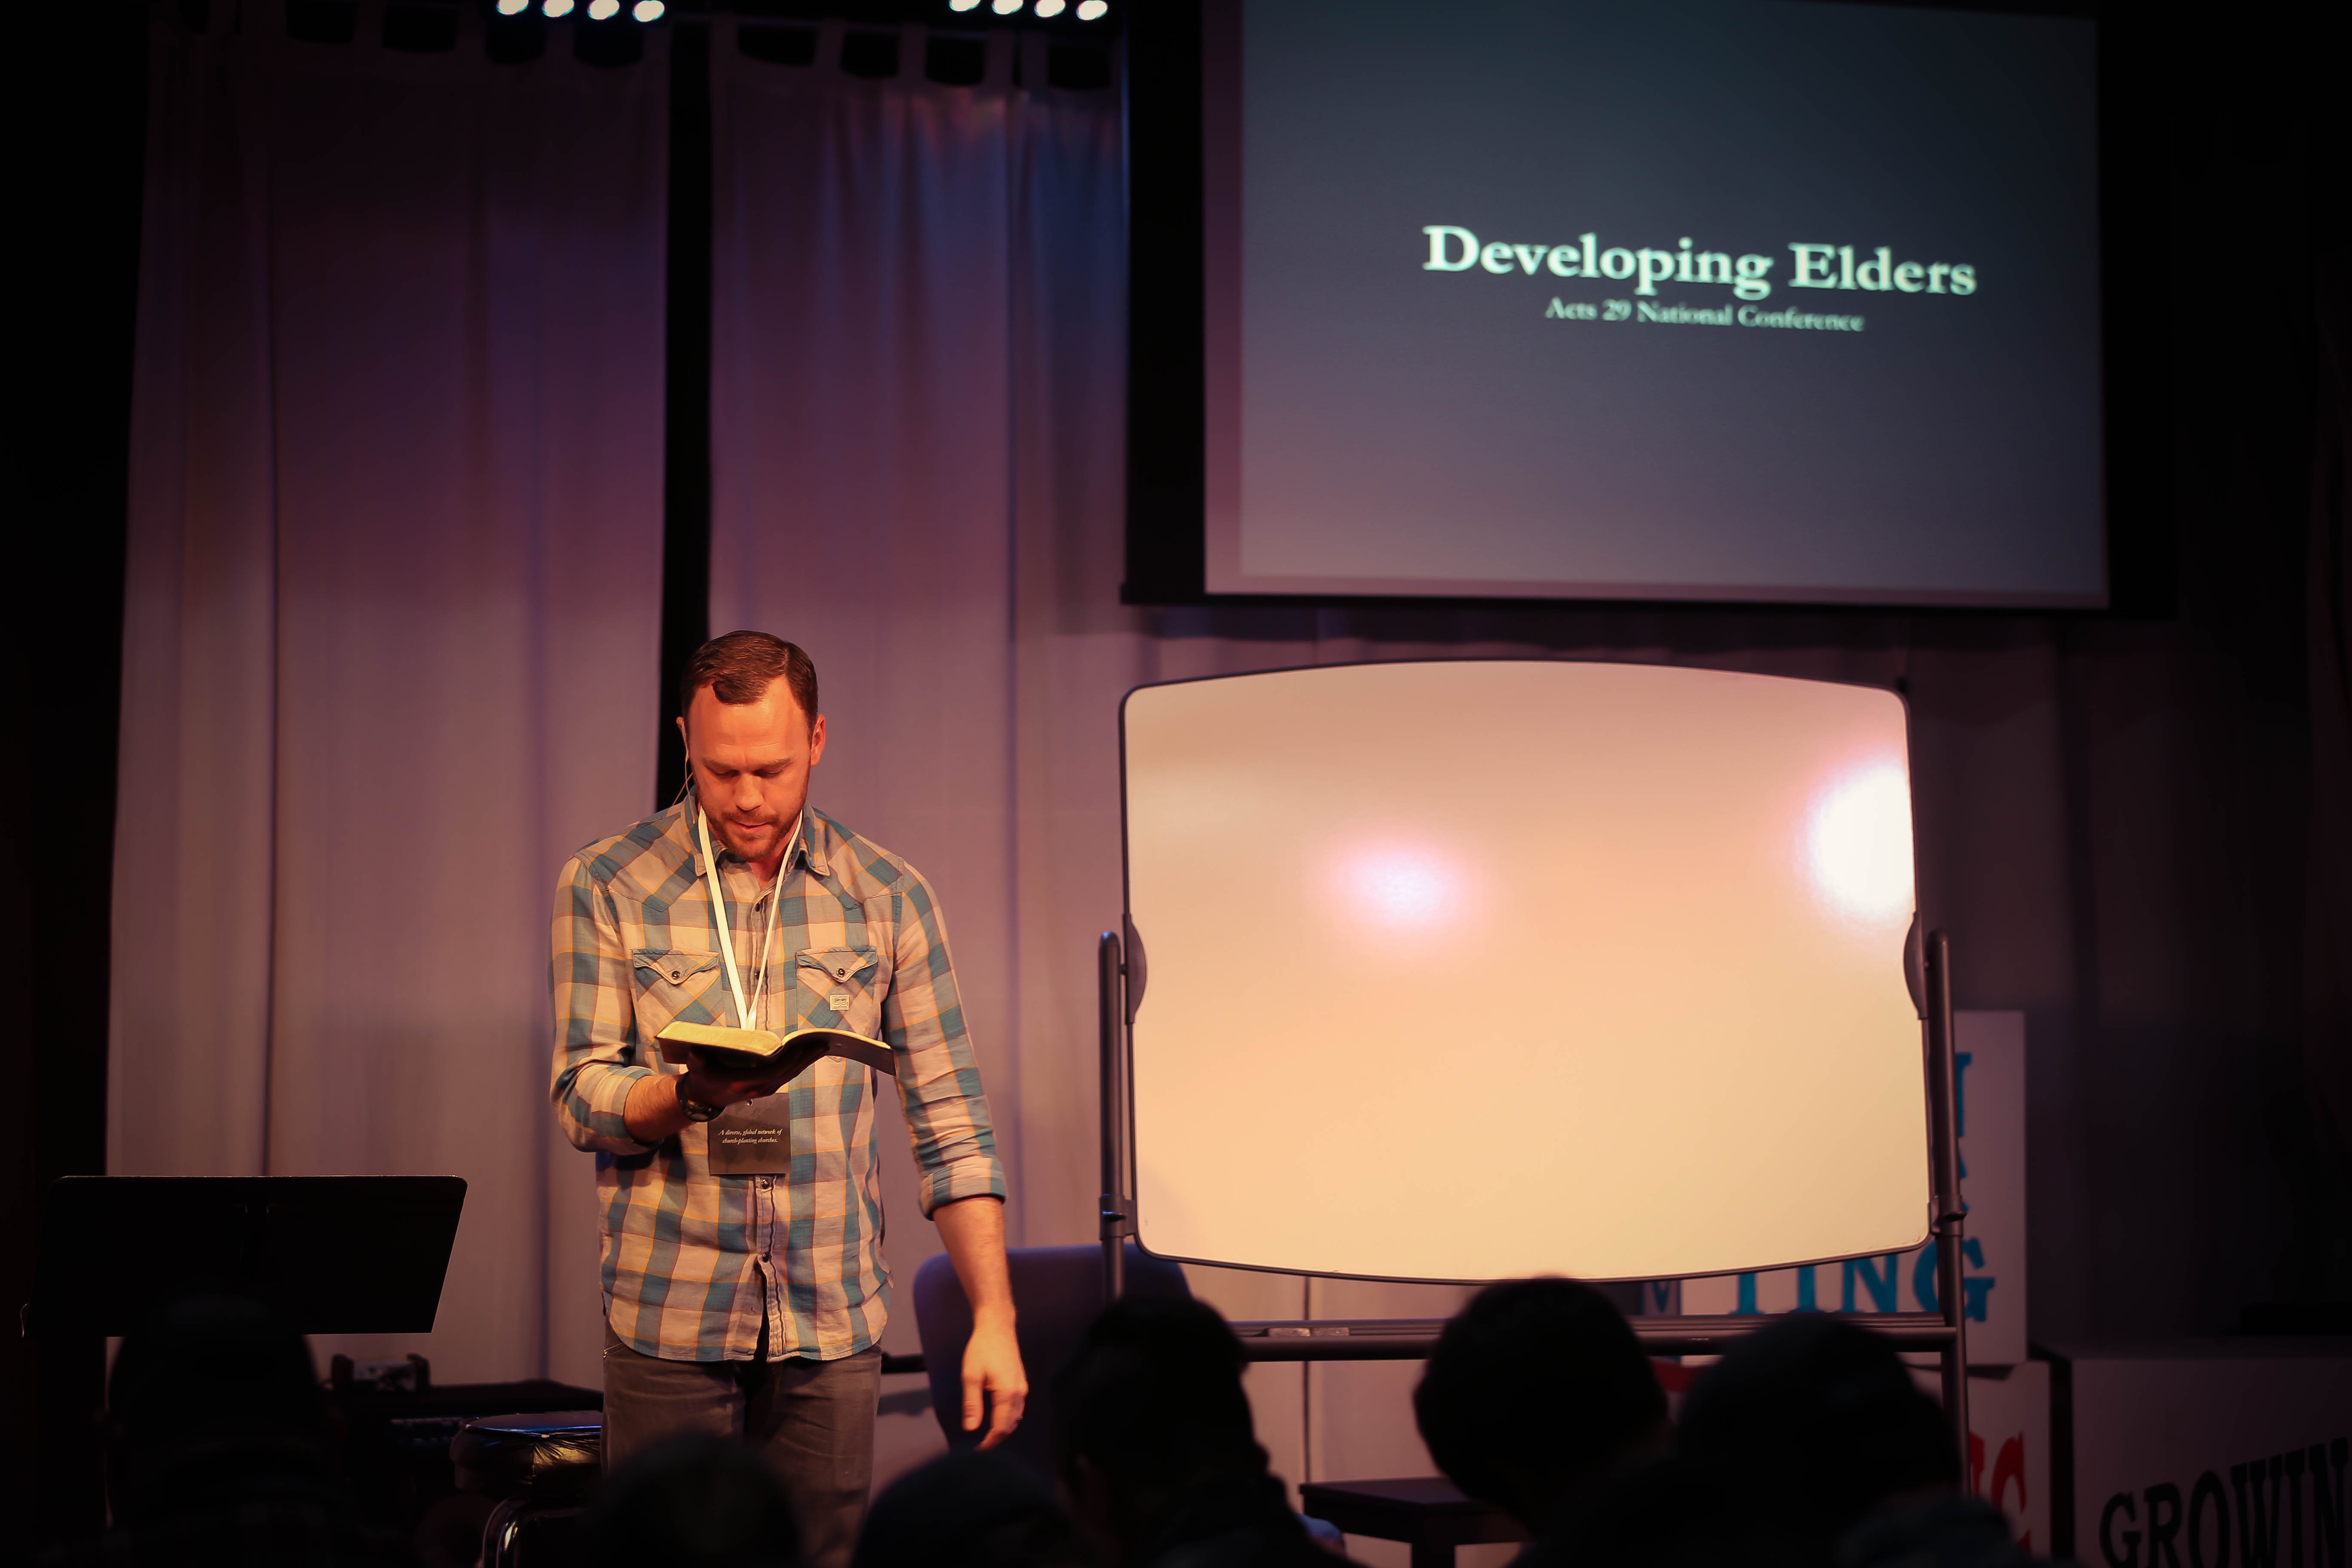 Growing Godly Elders #2 | 50 – 100 Track